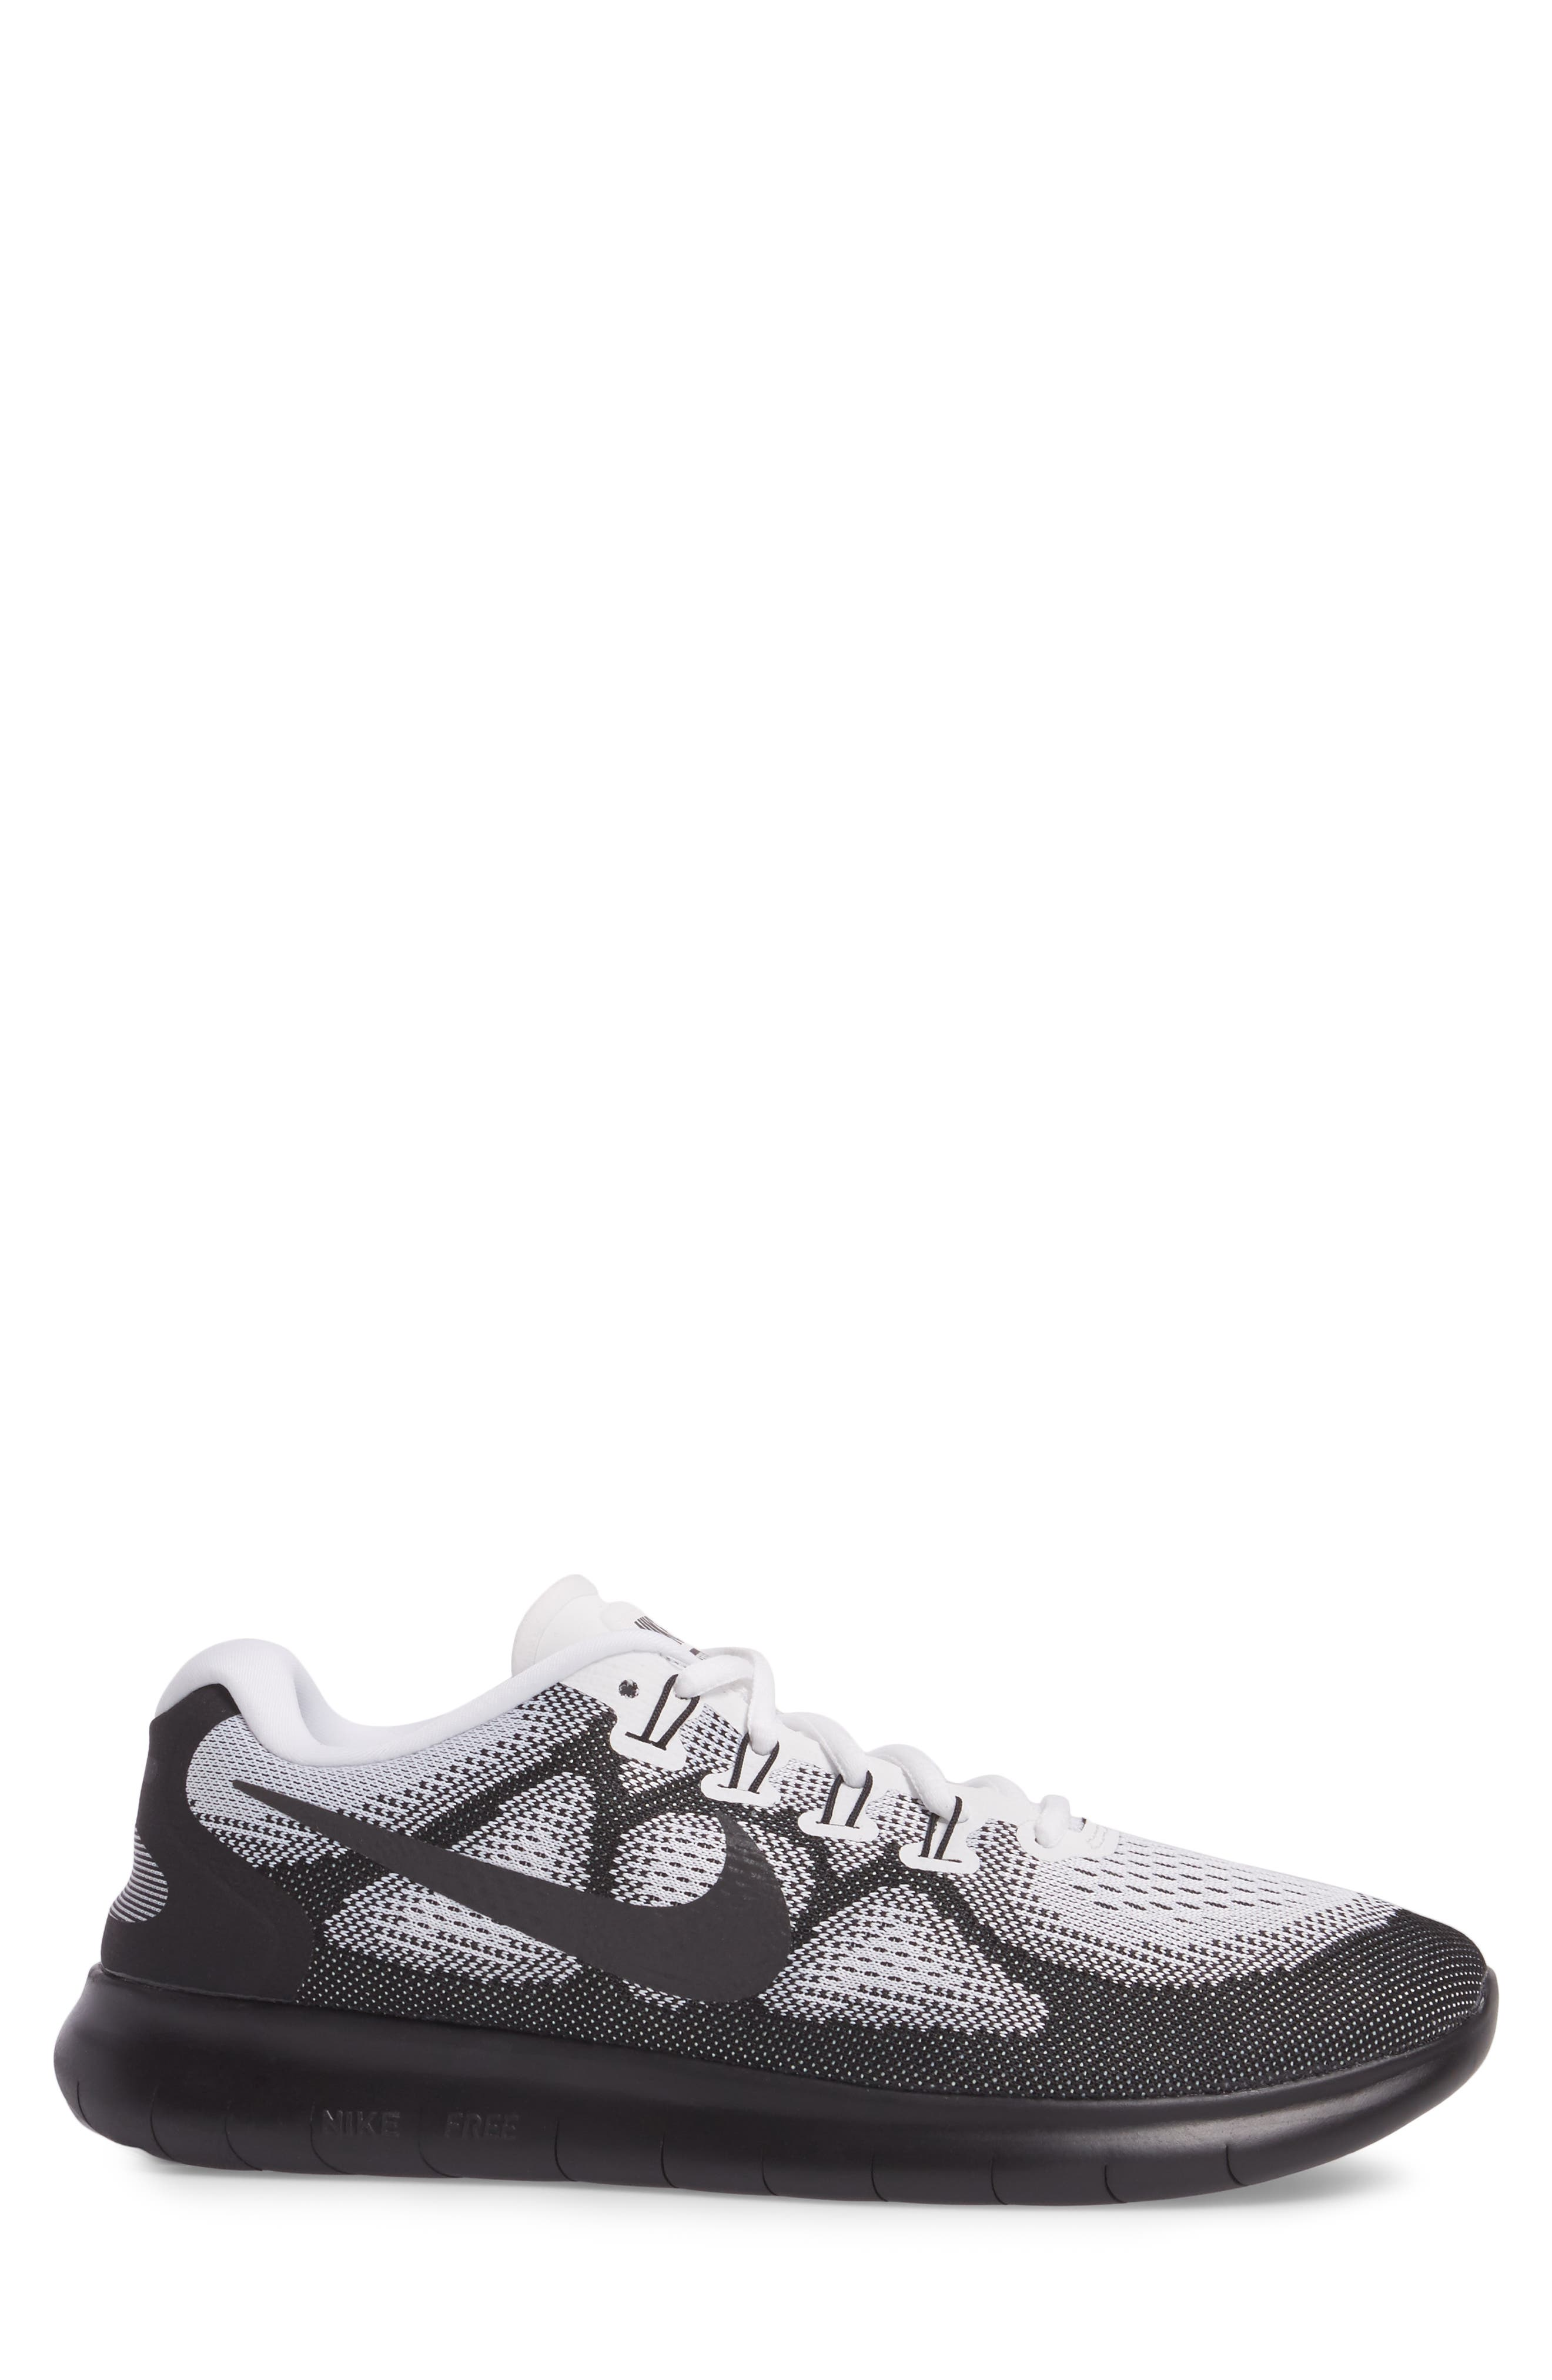 Free RN 2017 LE Running Shoe,                             Alternate thumbnail 3, color,                             Black/Black/White